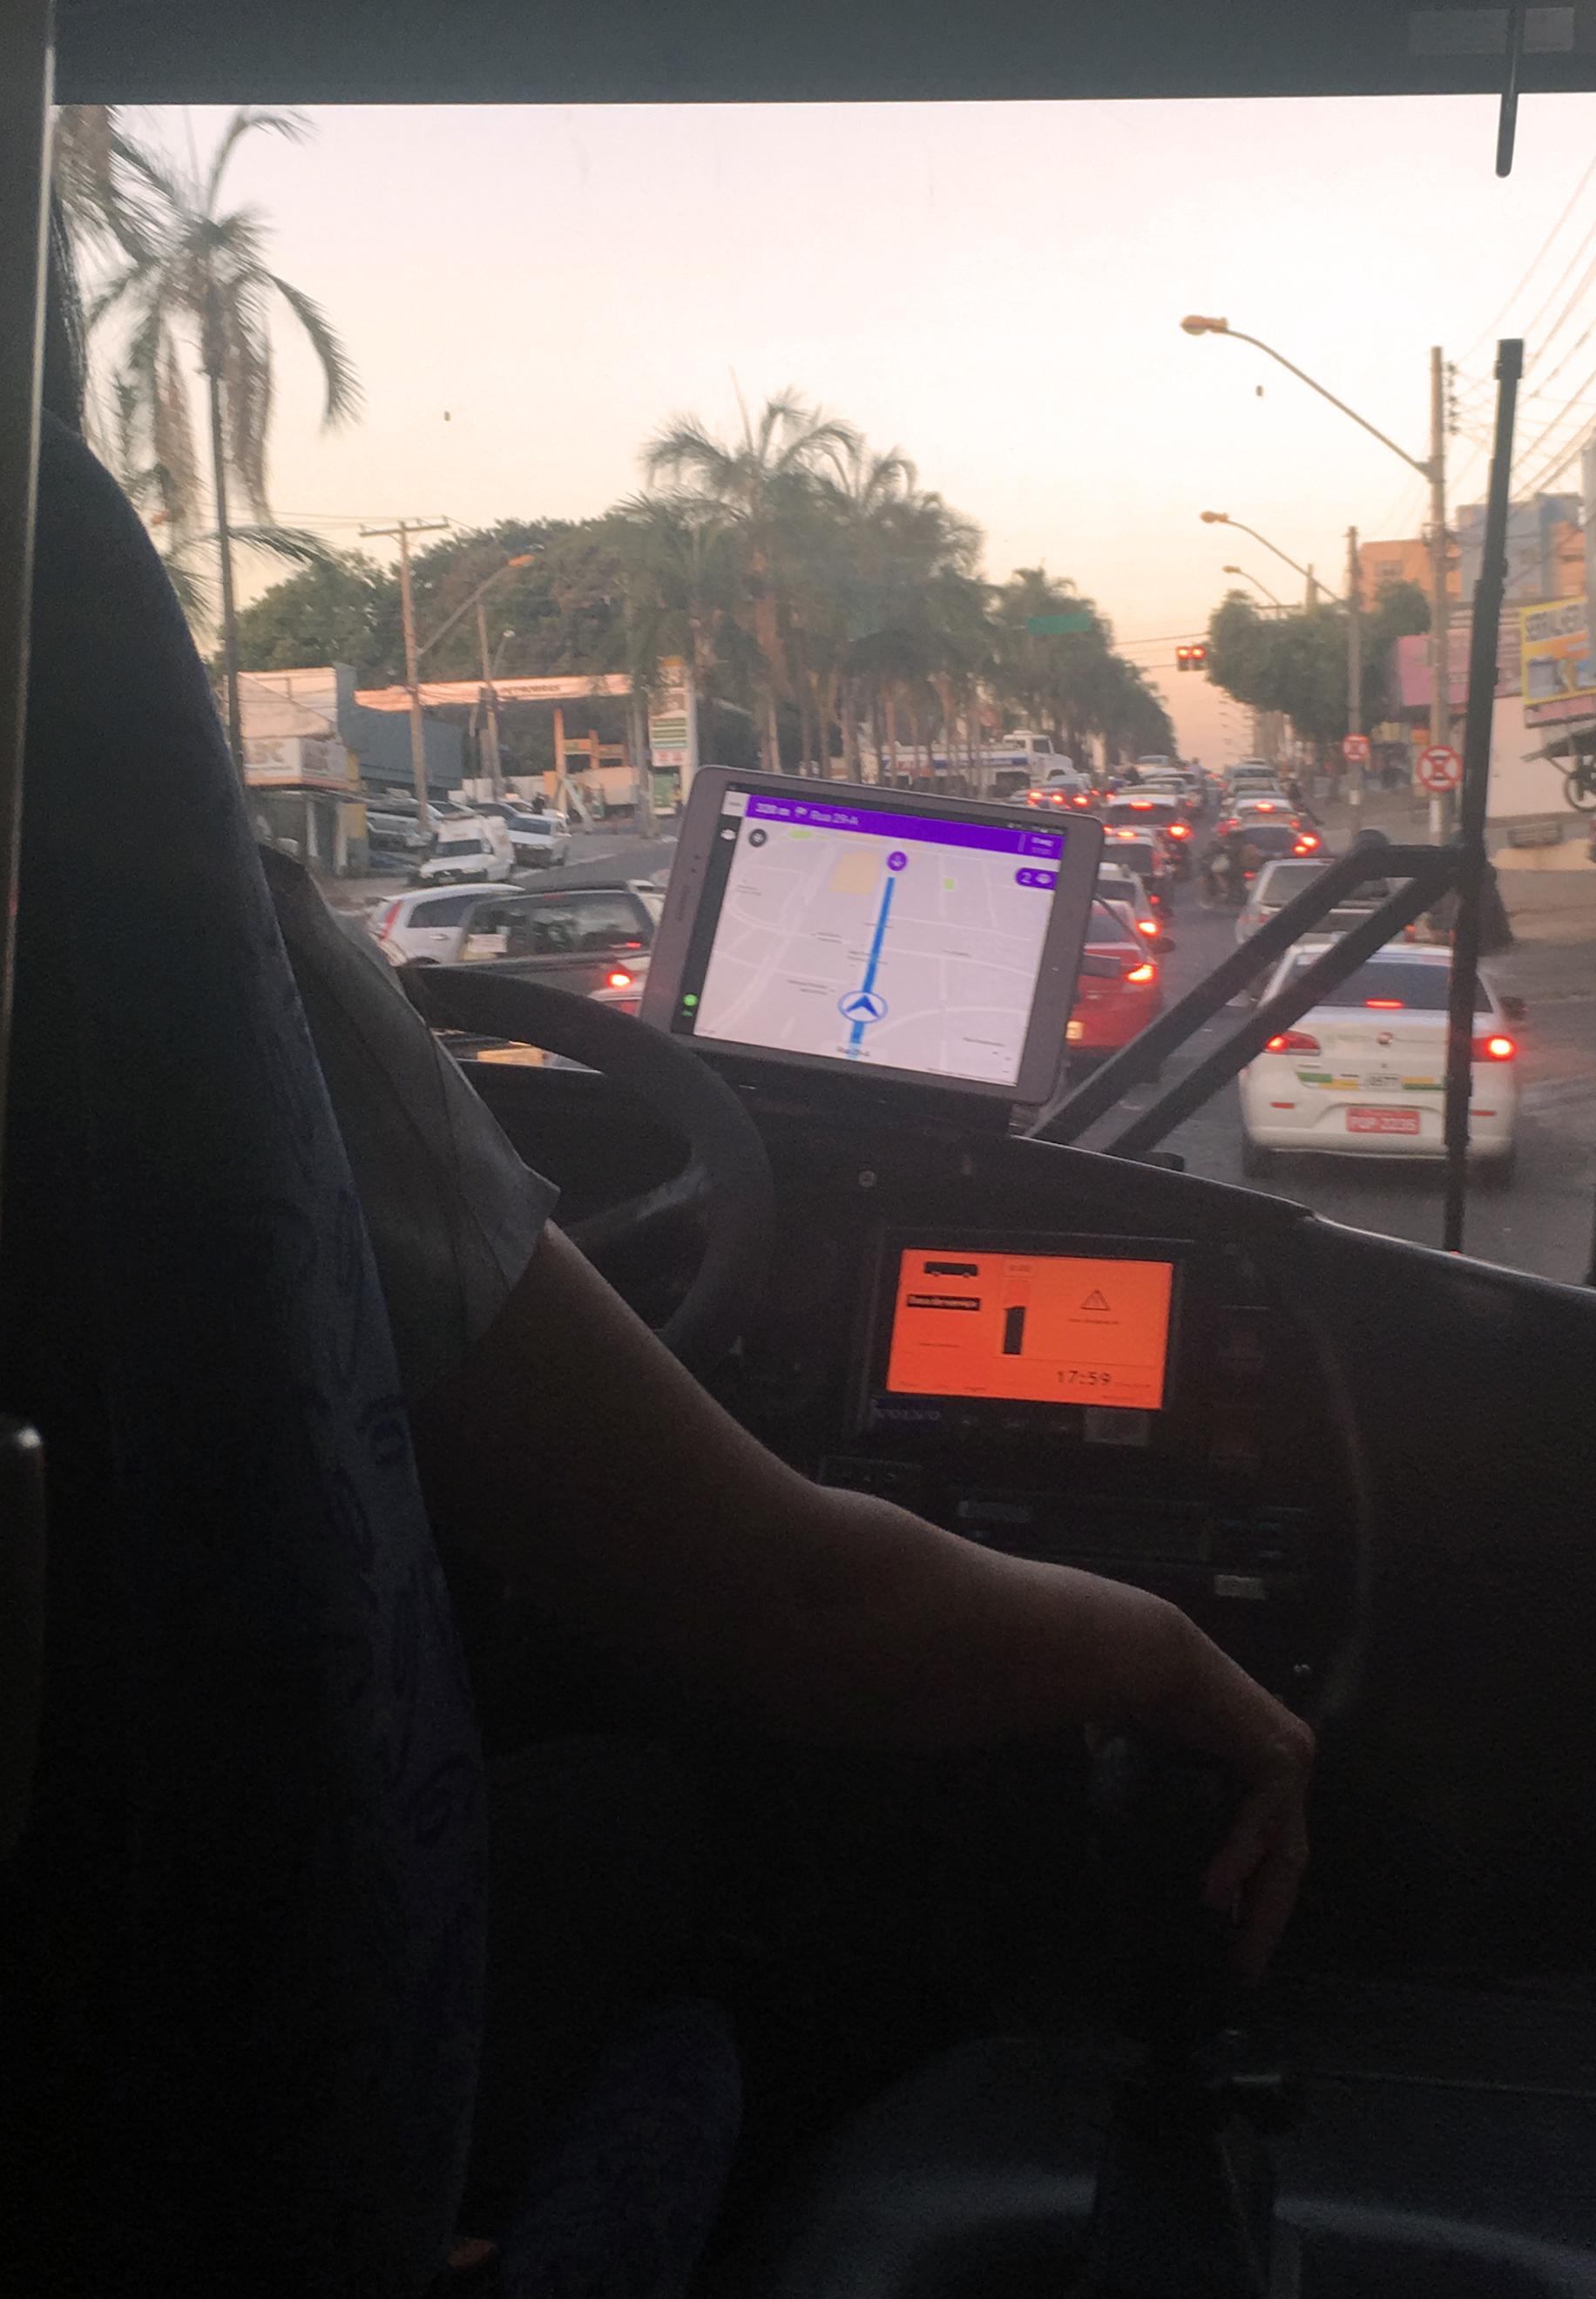 Test run in the city of Goiânia